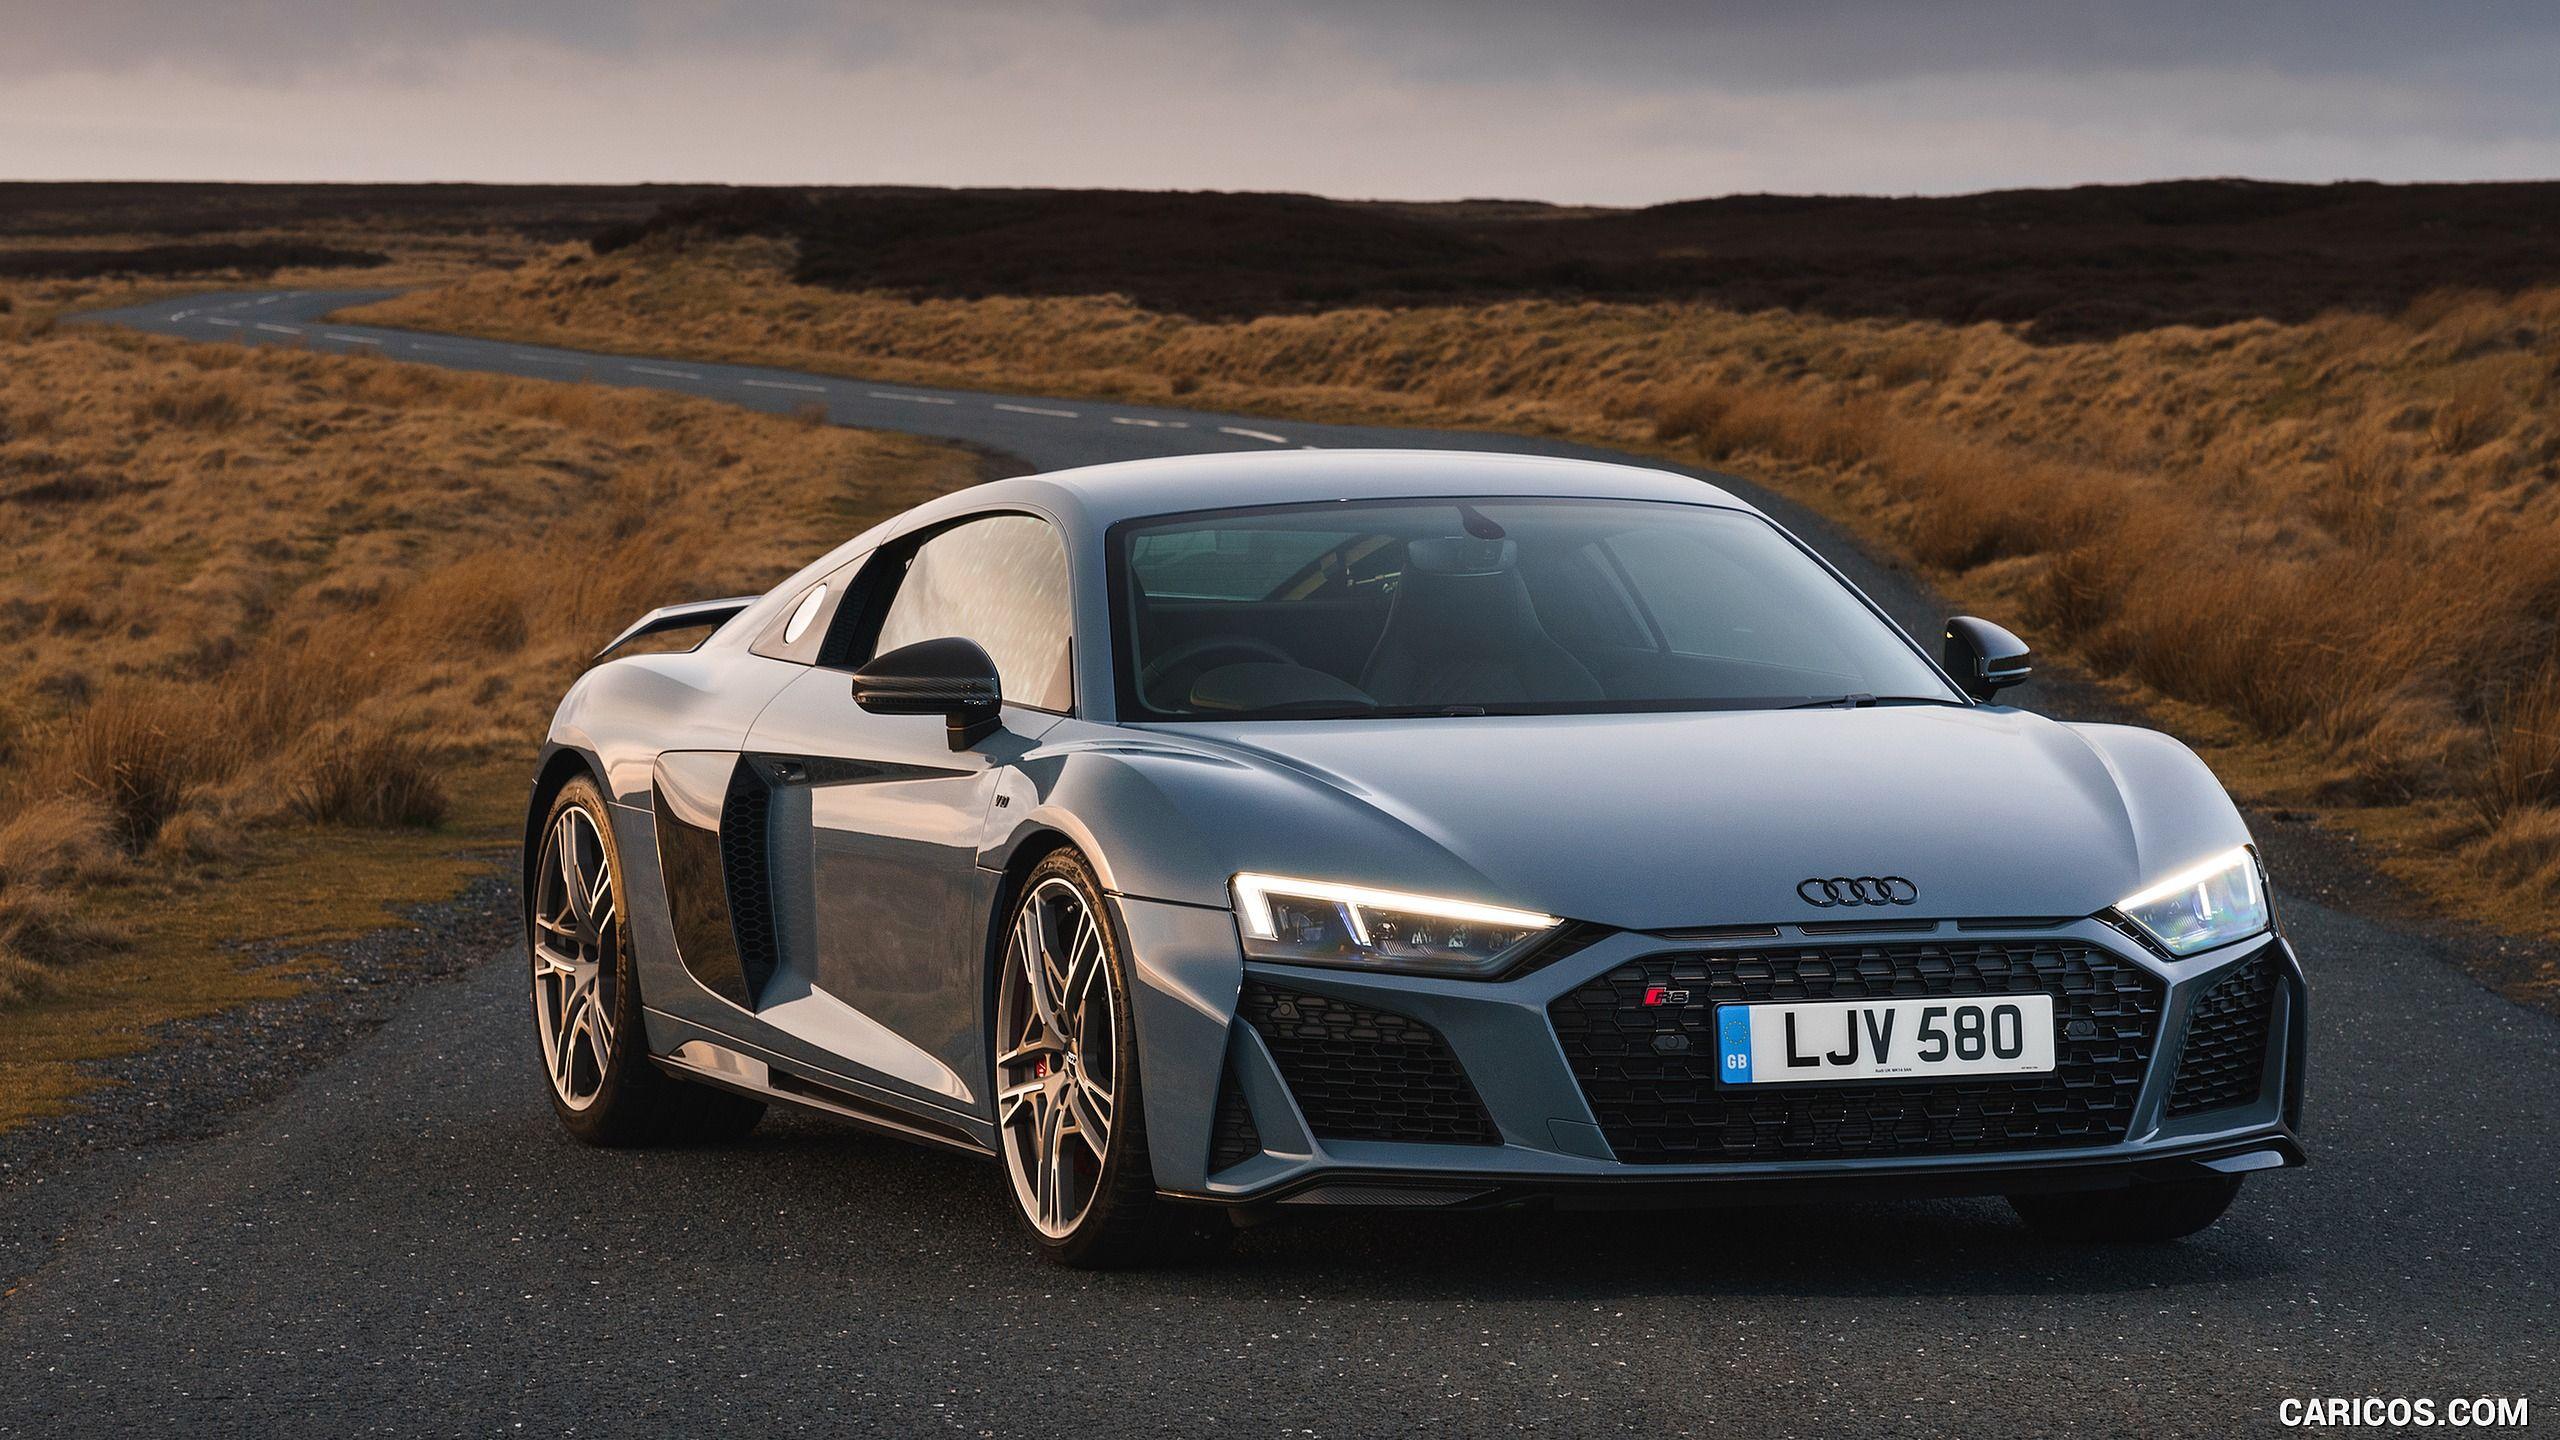 2019 Audi R8 V10 Coupe Performance Quattro Uk Spec Audi Audi R8 V10 Audi R8